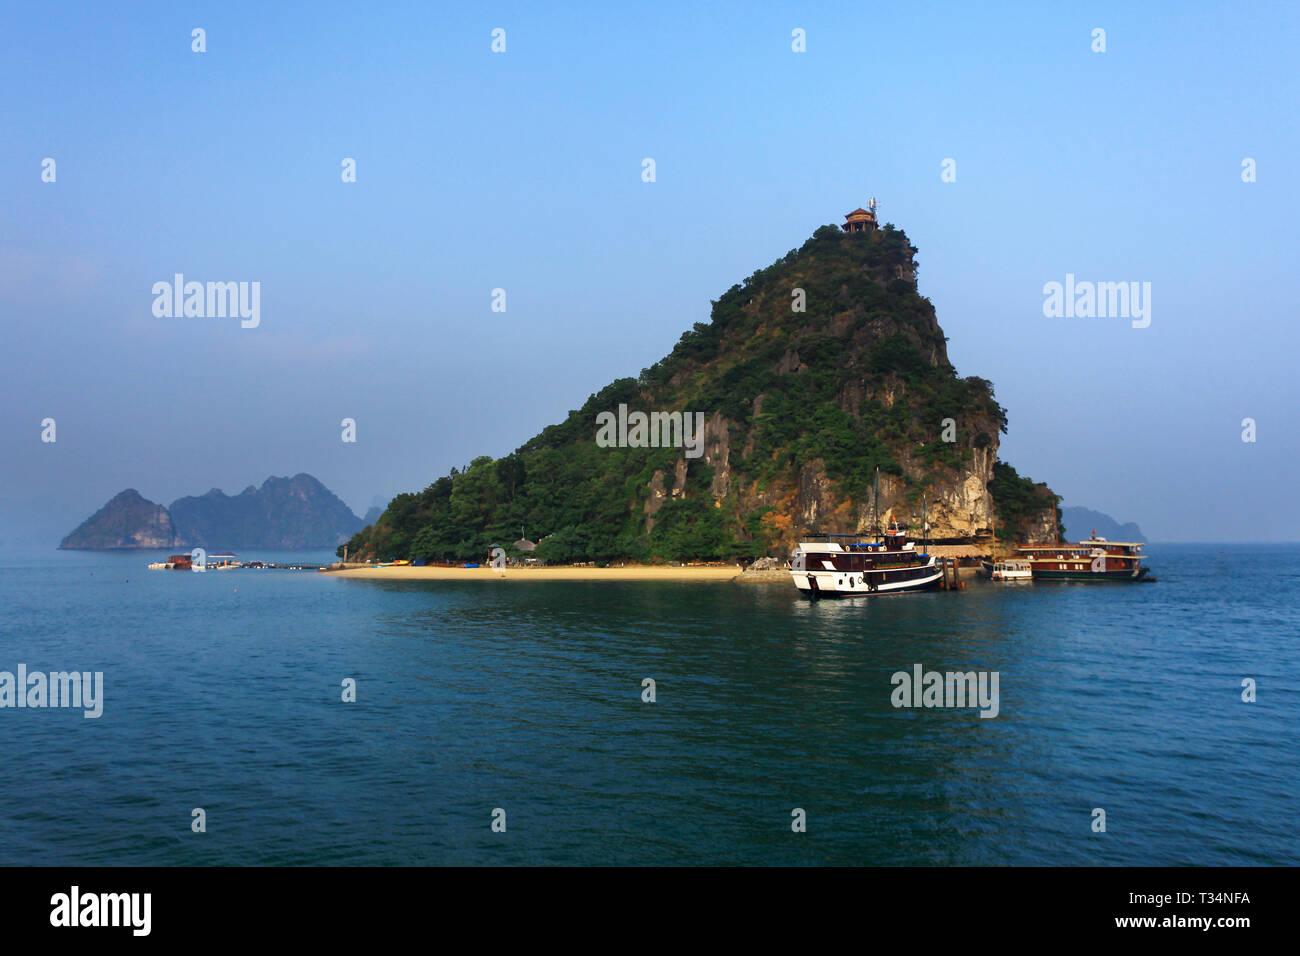 Boats anchored in Ha Long Bay, Quang Ninh Province, Vietnam Stock Photo